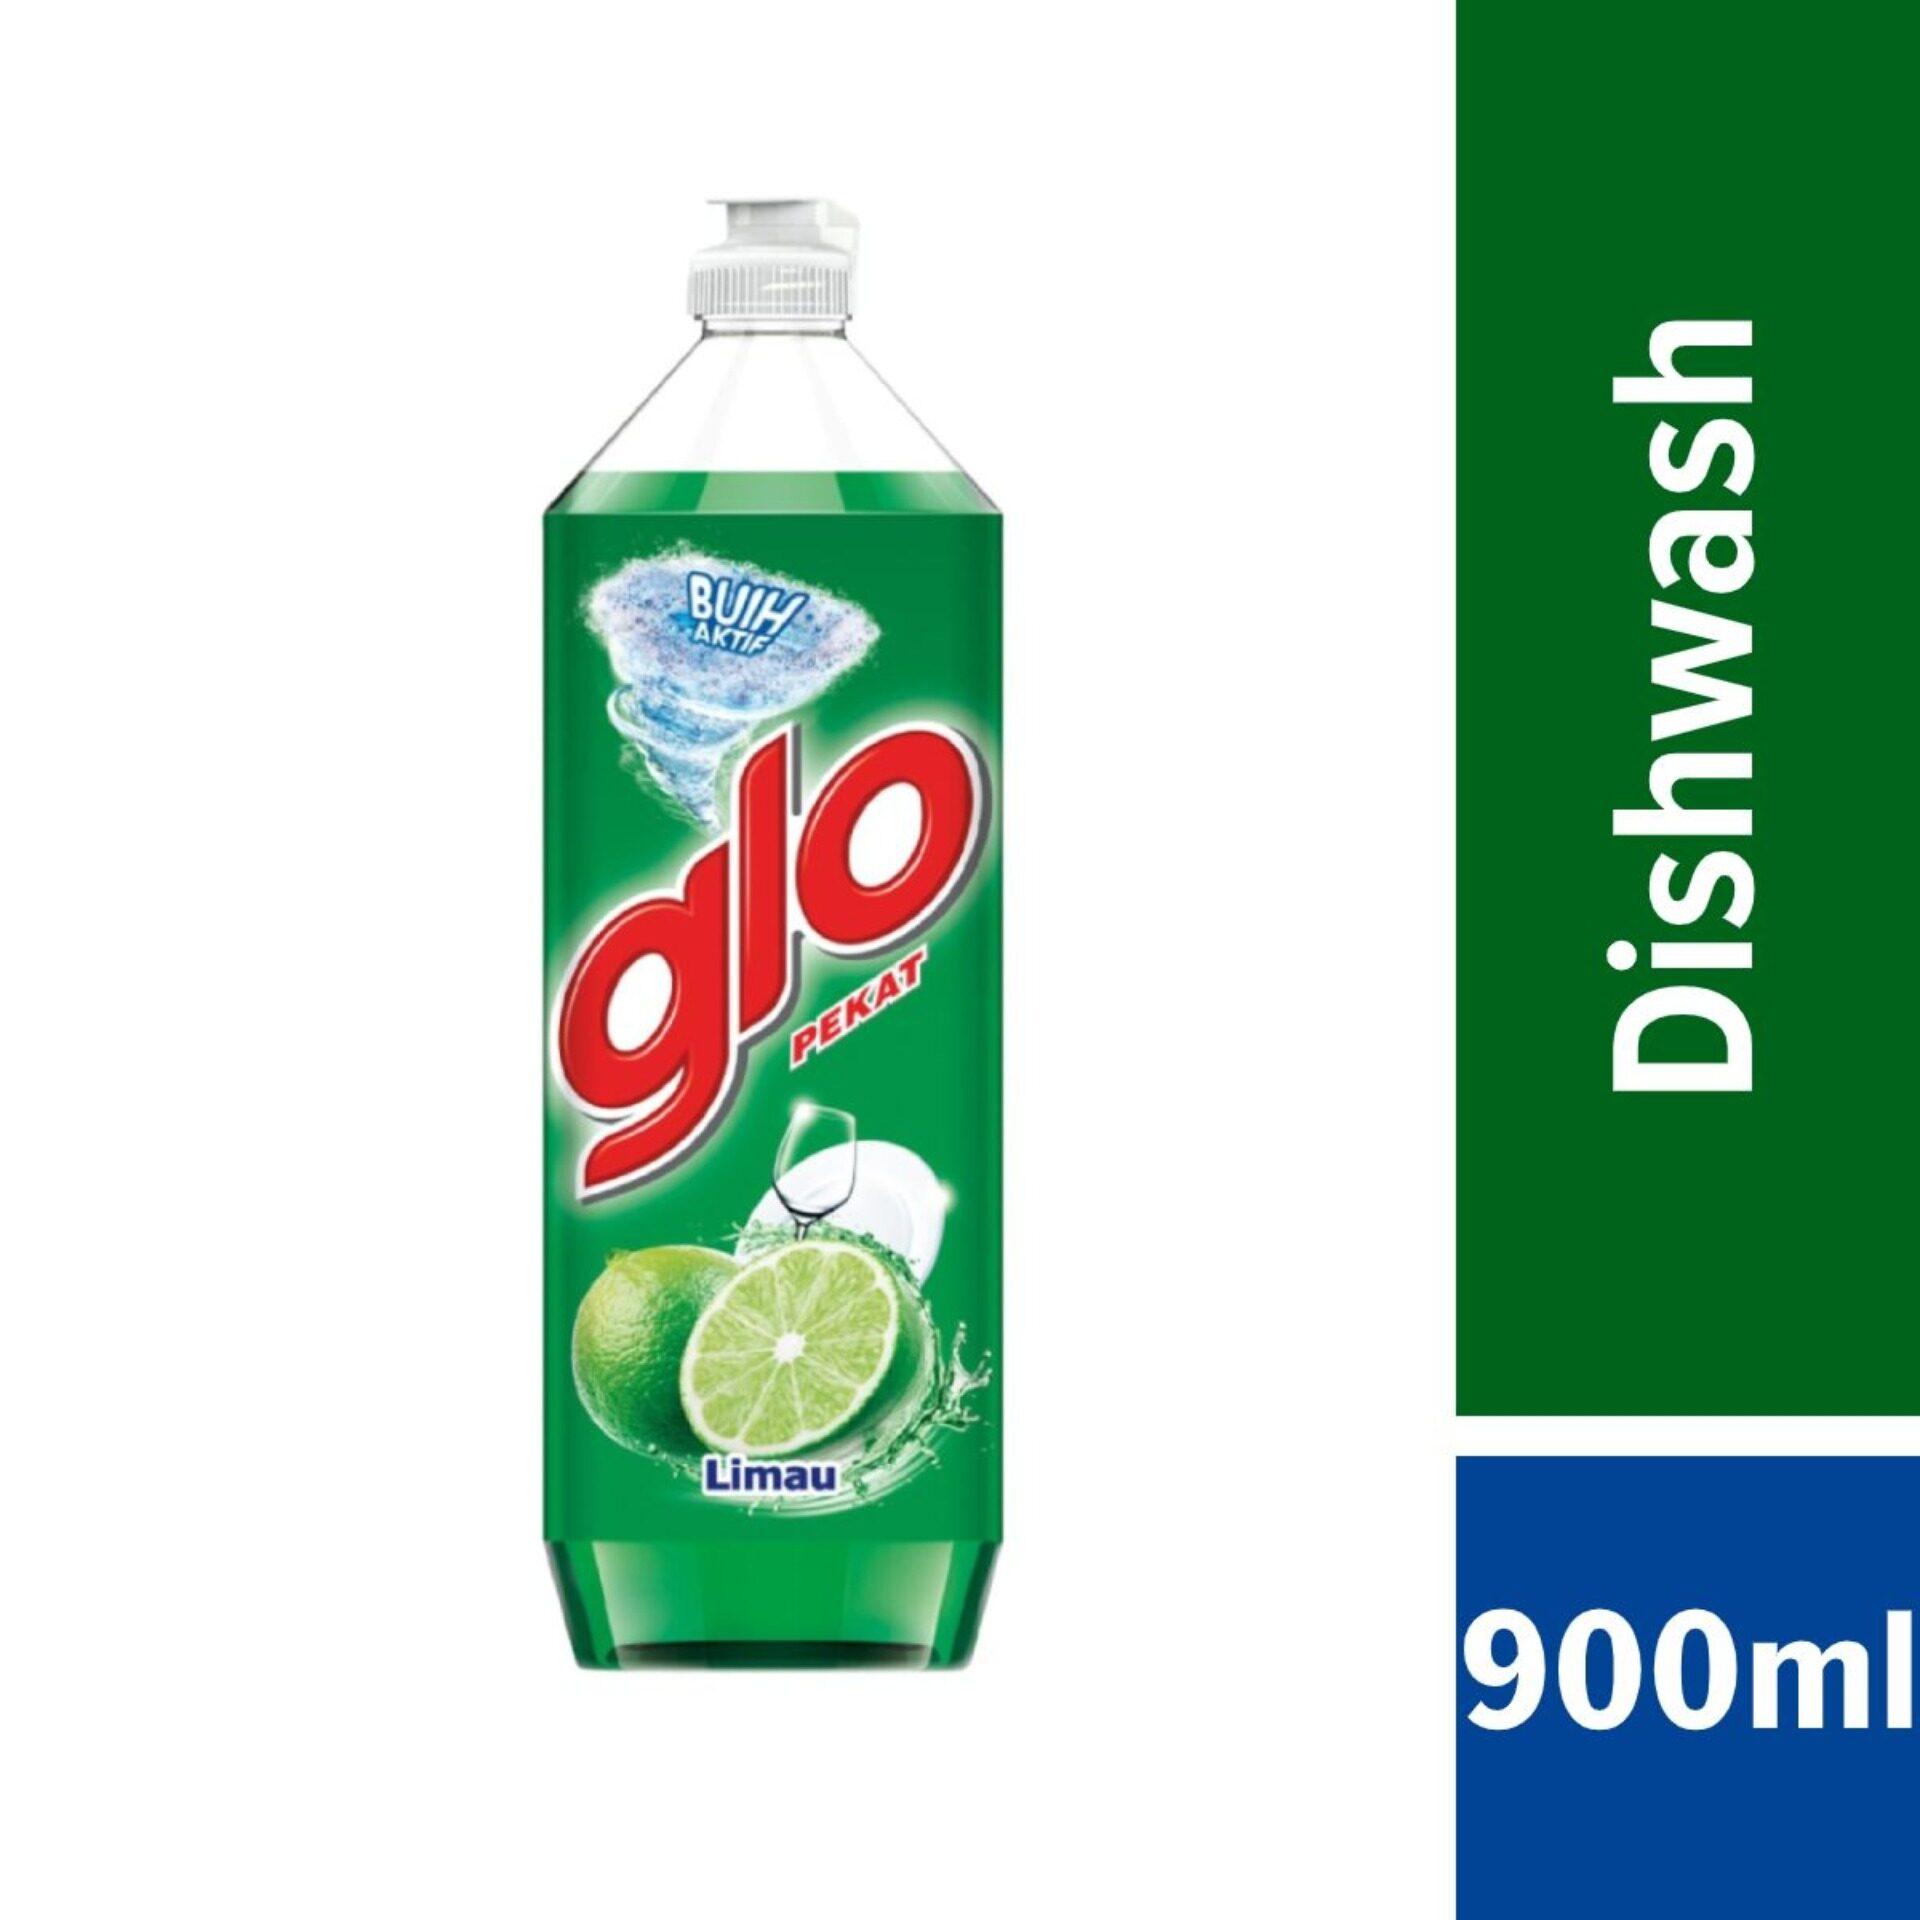 Glo Pekat Lime Dishwashing Liquid 900ml